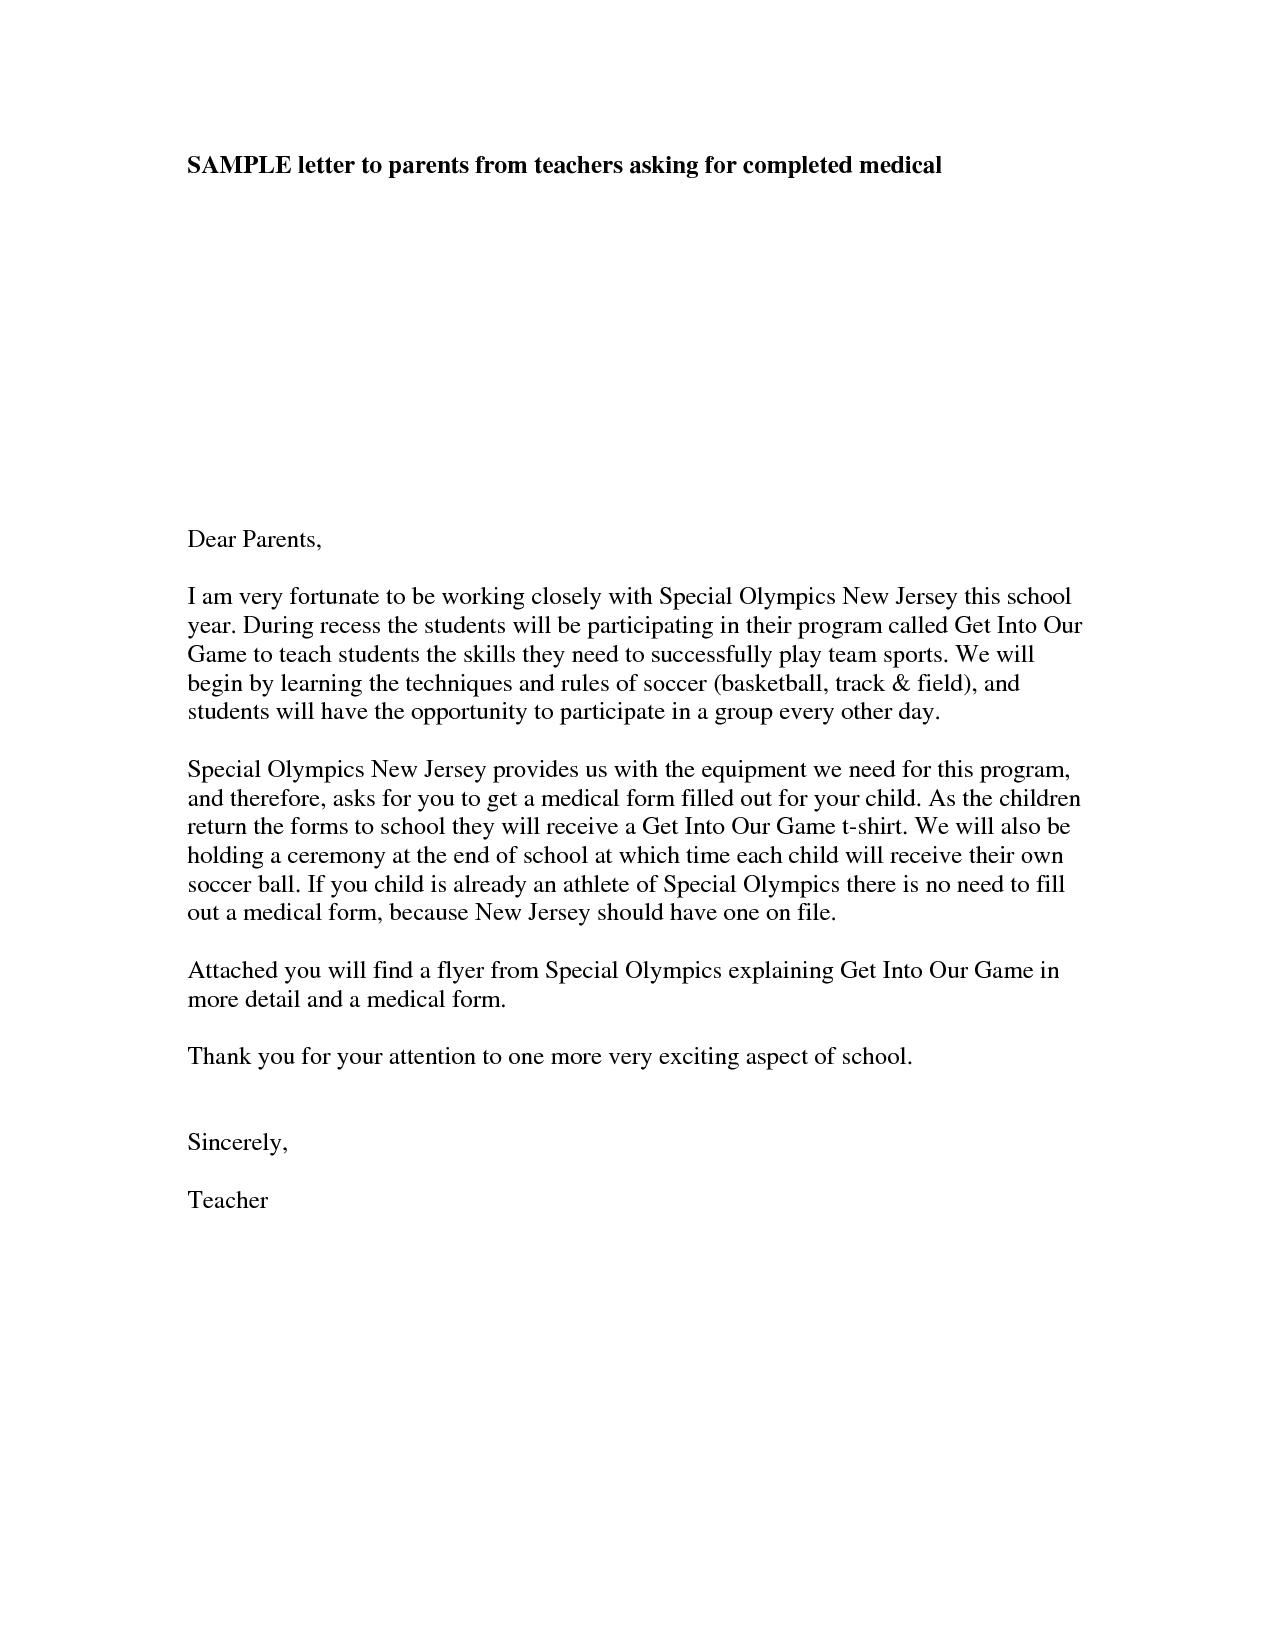 teacher letter to a parent google search